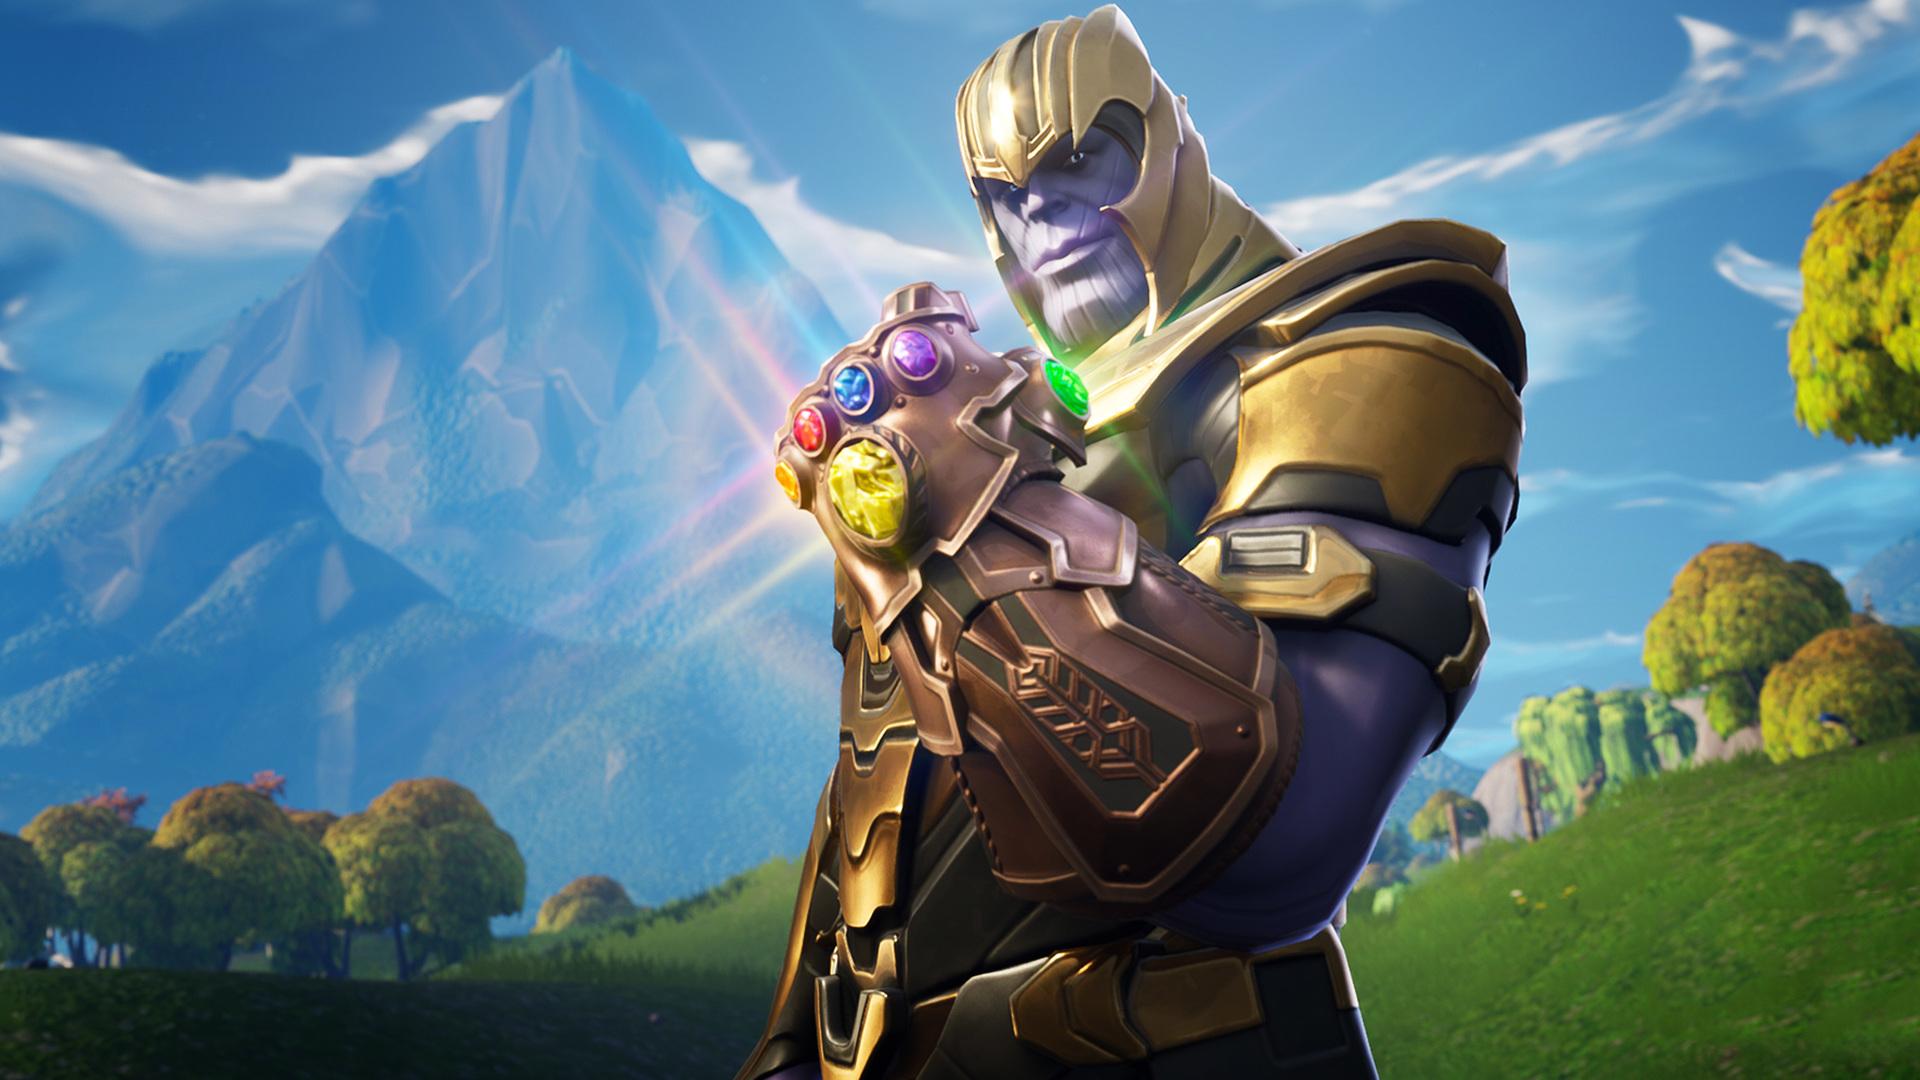 1920x1080 Thanos In Fortnite Battle Royale Laptop Full HD 1080P HD 1920x1080